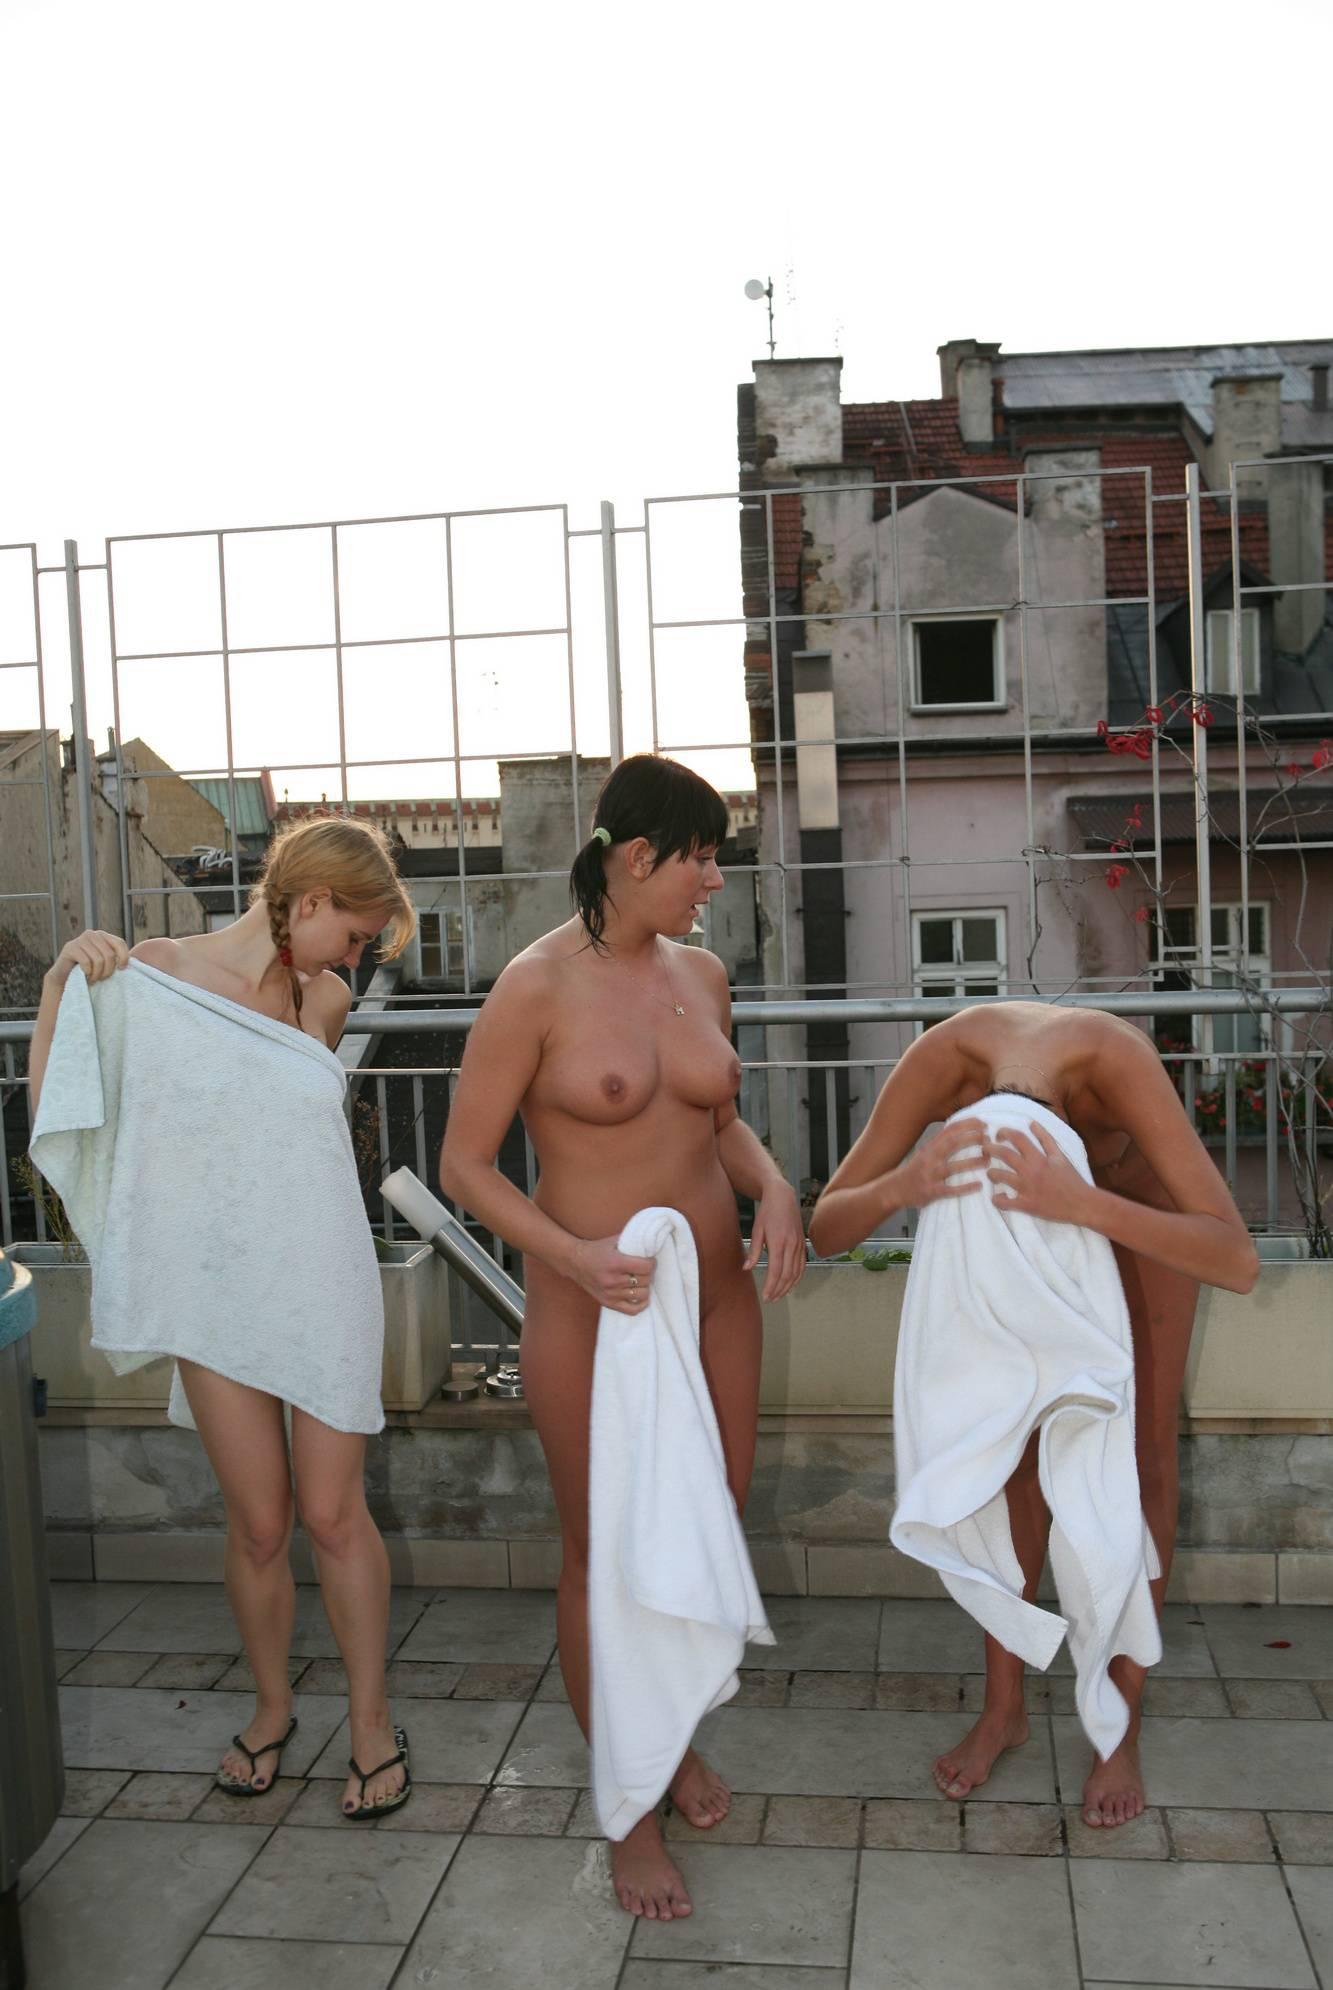 Nudist Pics Jacuzzi Towel Dry Down - 2